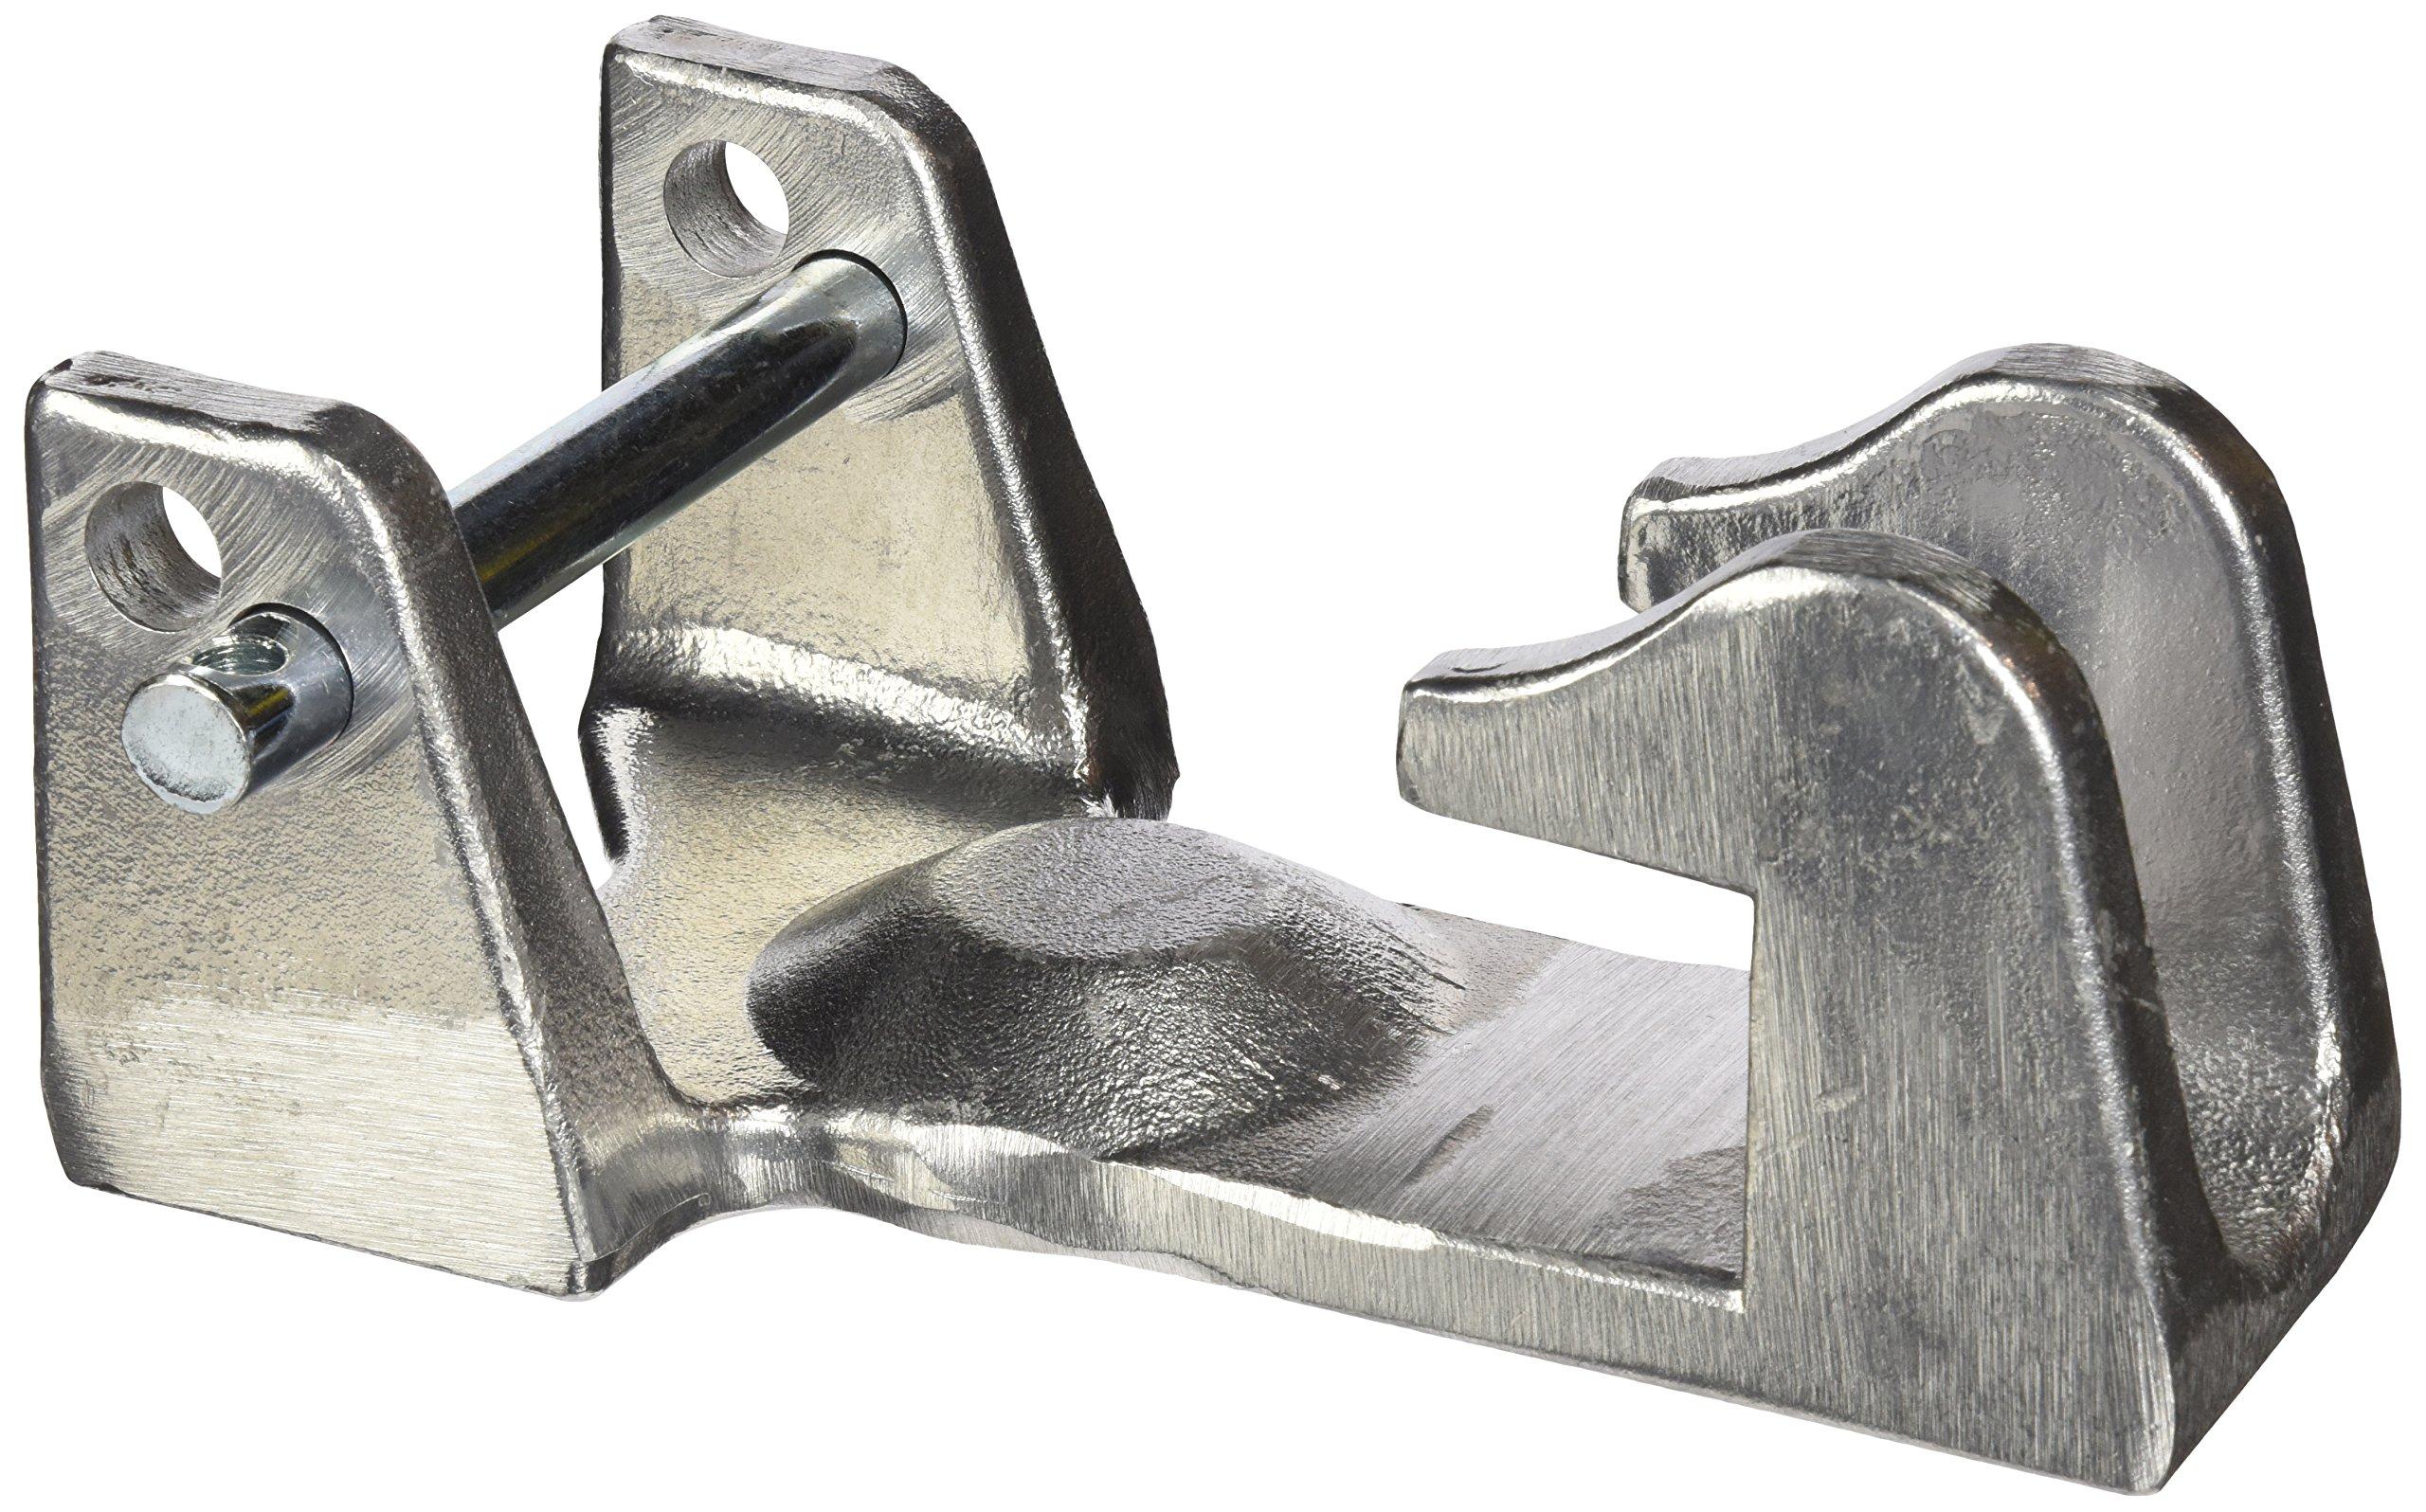 Blaylock TL-50 Gooseneck-Style Coupler Lock by Blaylock Industries